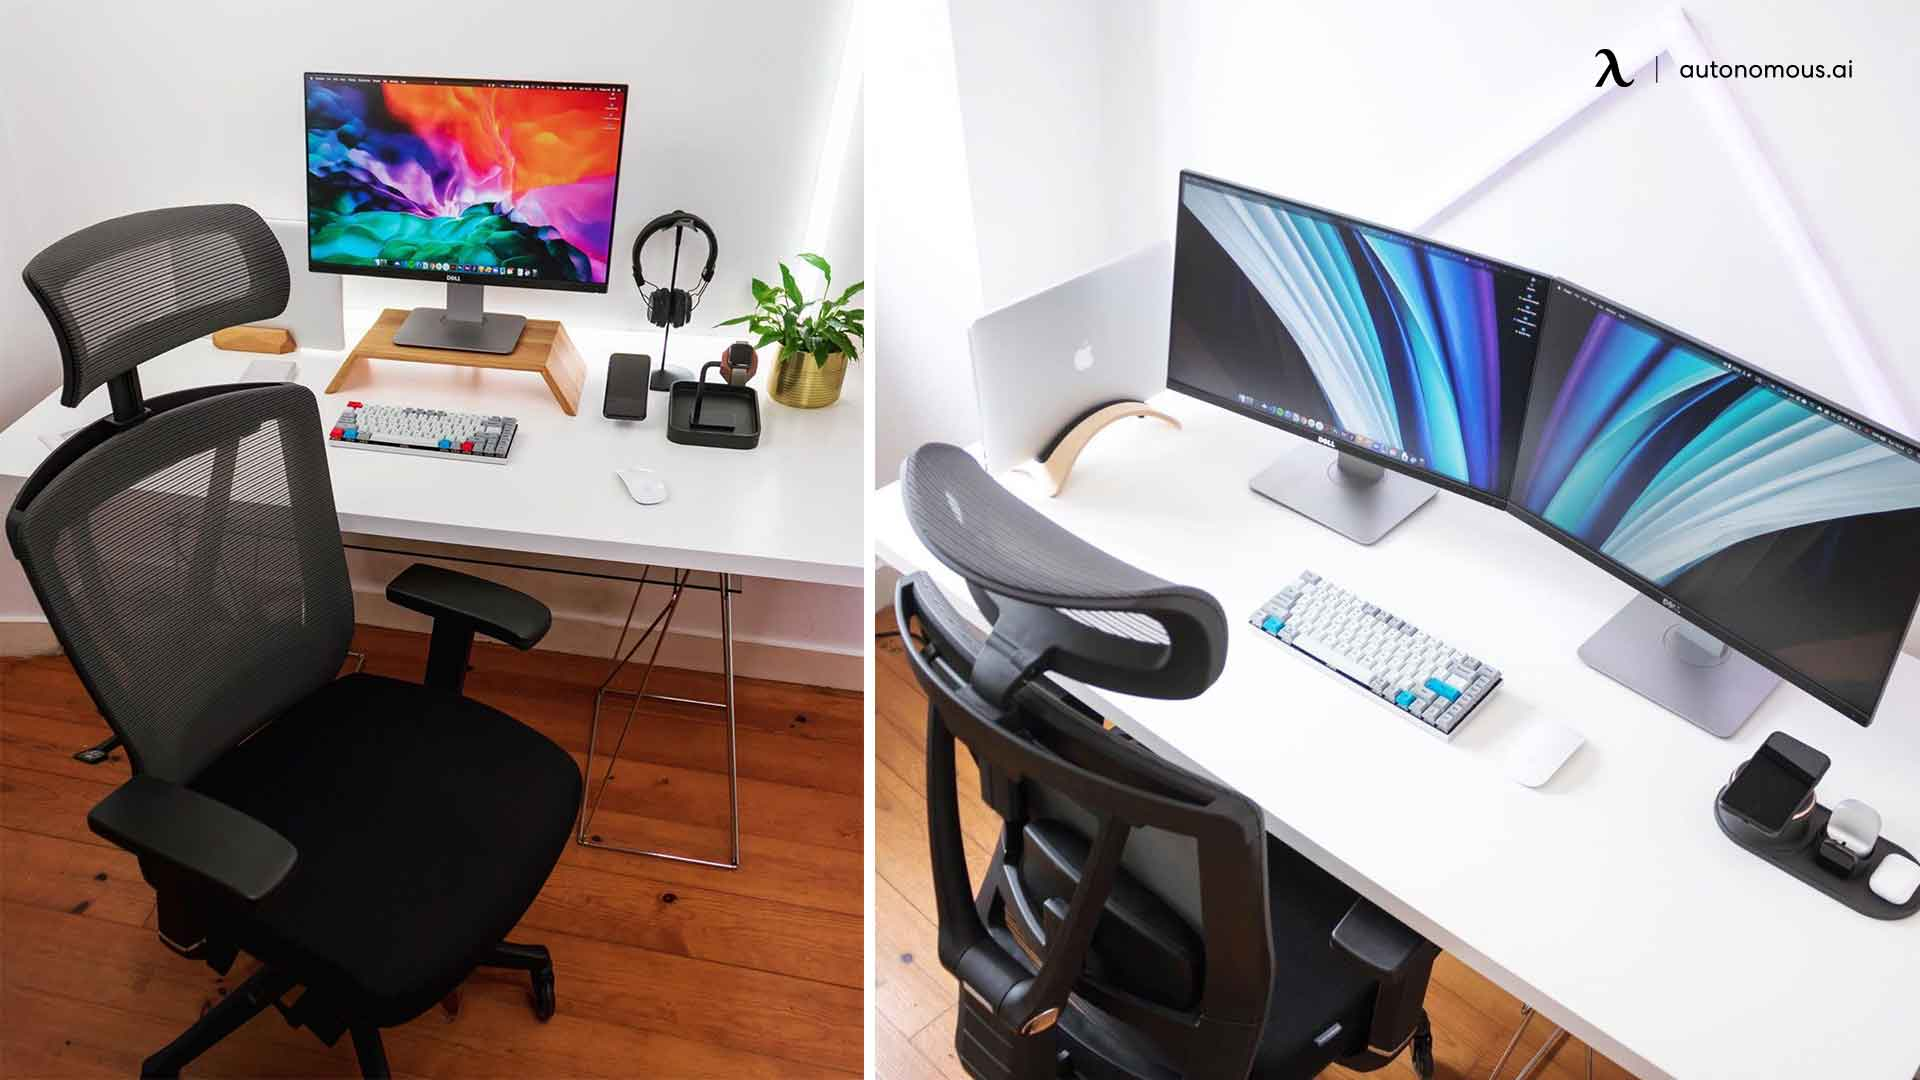 ergonomic chair - office setup